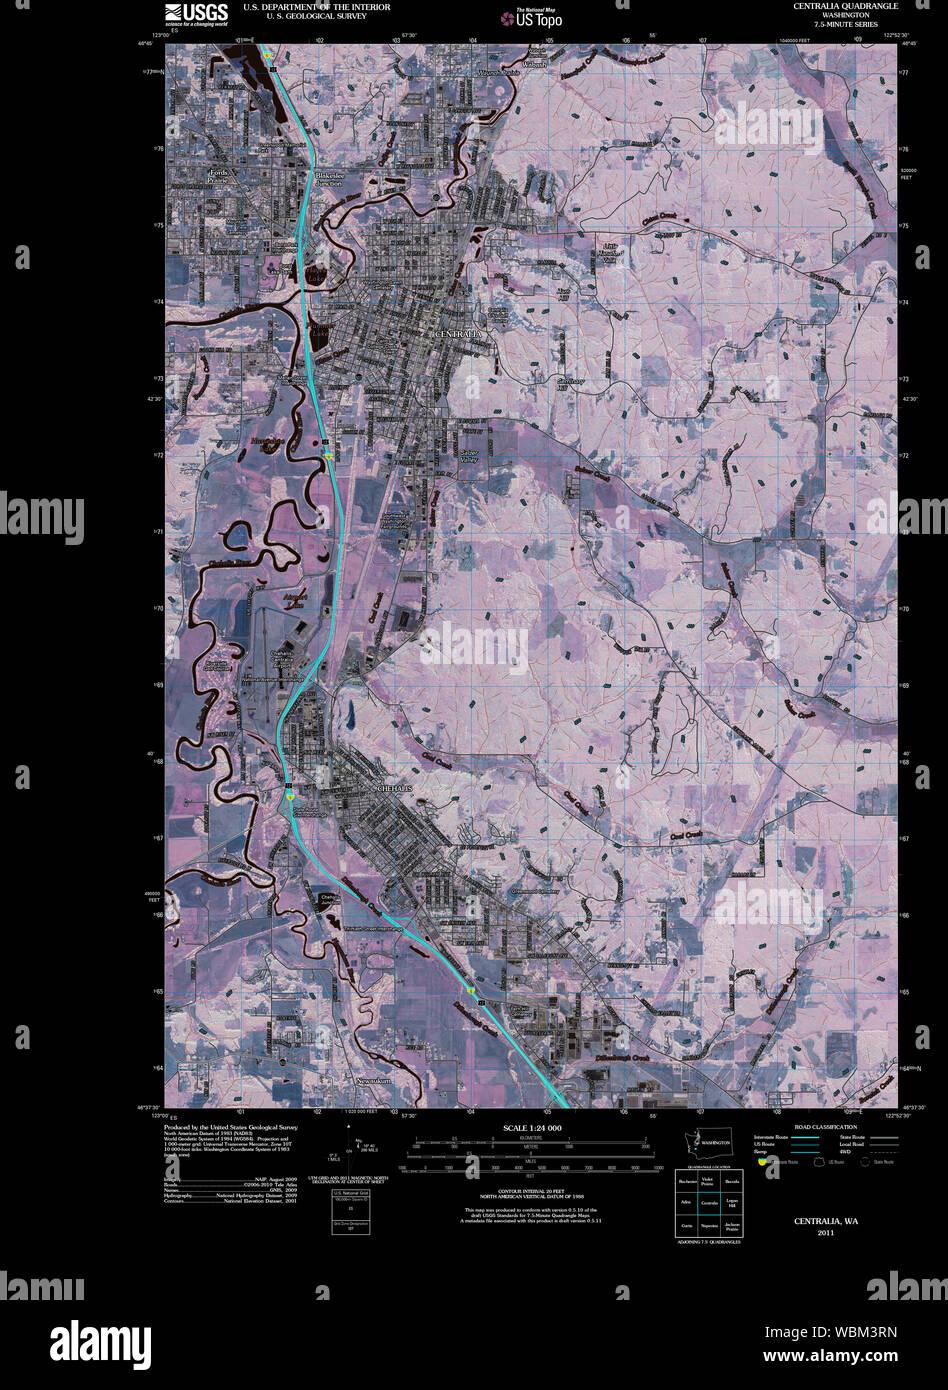 Centralia Washington Stock Photos & Centralia Washington ... on map of mansfield wa, map of lake quinault wa, map of grays harbor county wa, map of addy wa, map of south seattle wa, map of ravensdale wa, map of hamilton wa, map of napavine wa, map of chesaw wa, map of anatone wa, map of nine mile falls wa, map of white center wa, map of camp murray wa, map of satsop wa, map of clallam bay wa, map of lake washington wa, map of west olympia wa, map of chewelah wa, map of deer harbor wa, map of wilkeson wa,